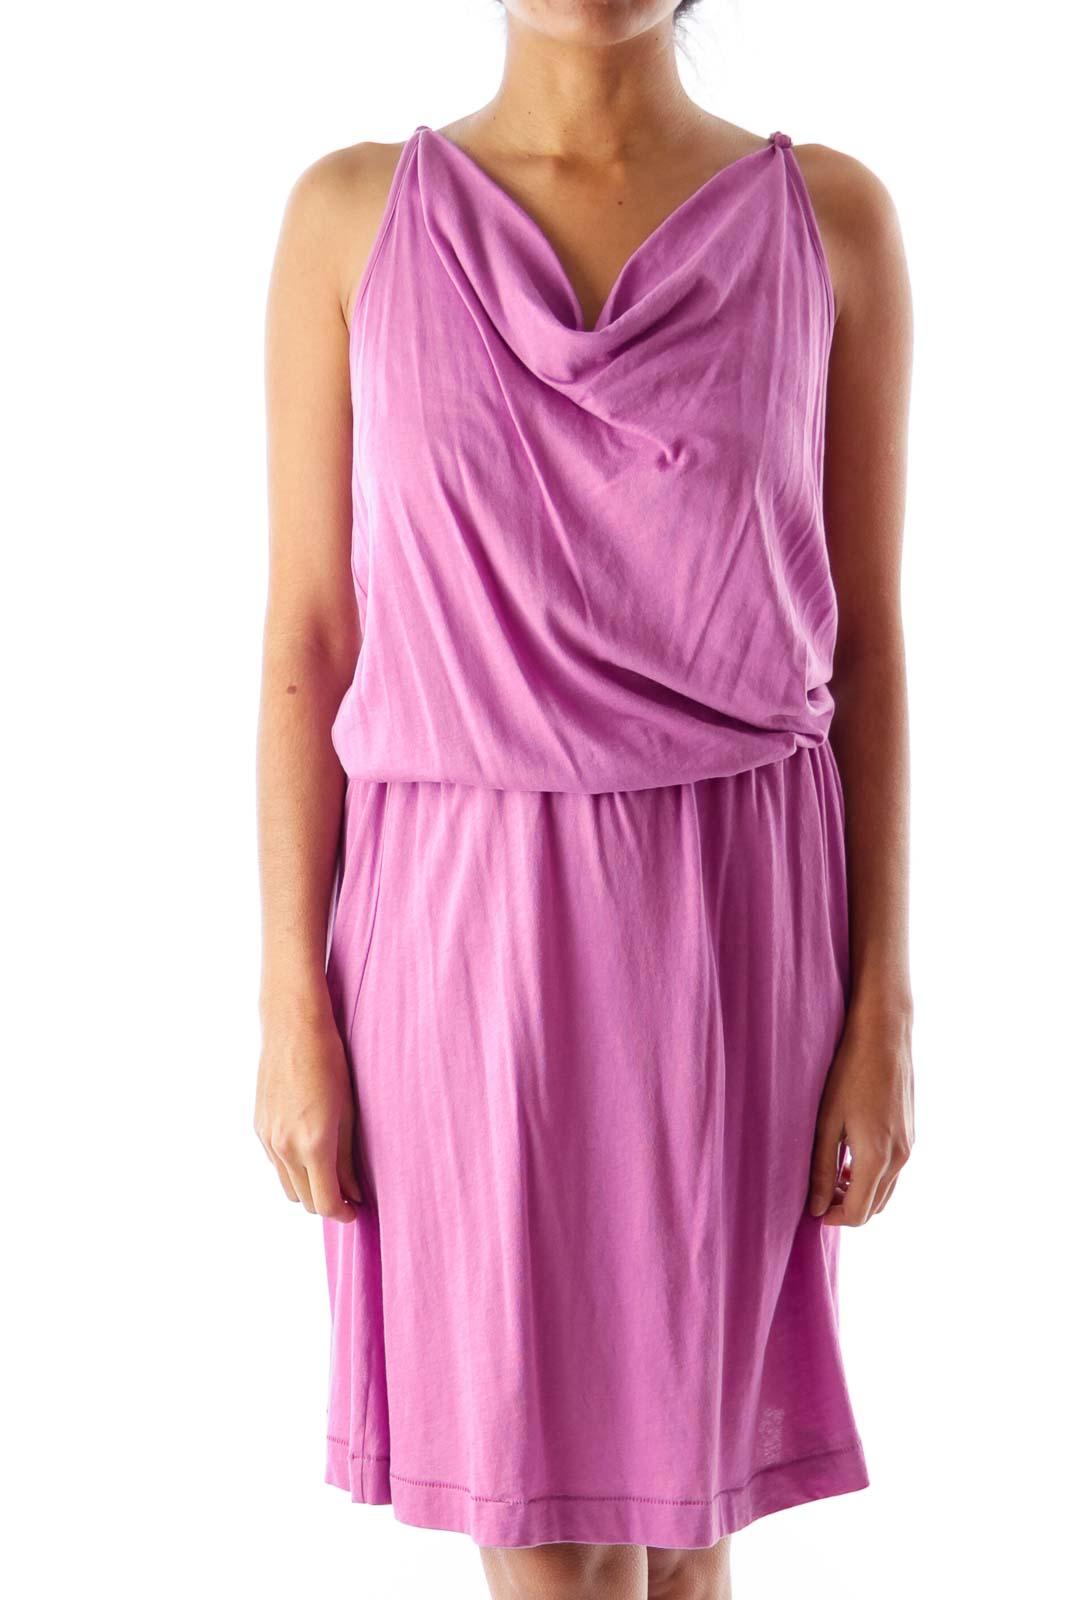 Purple Cowl Neck Tank Dress Front